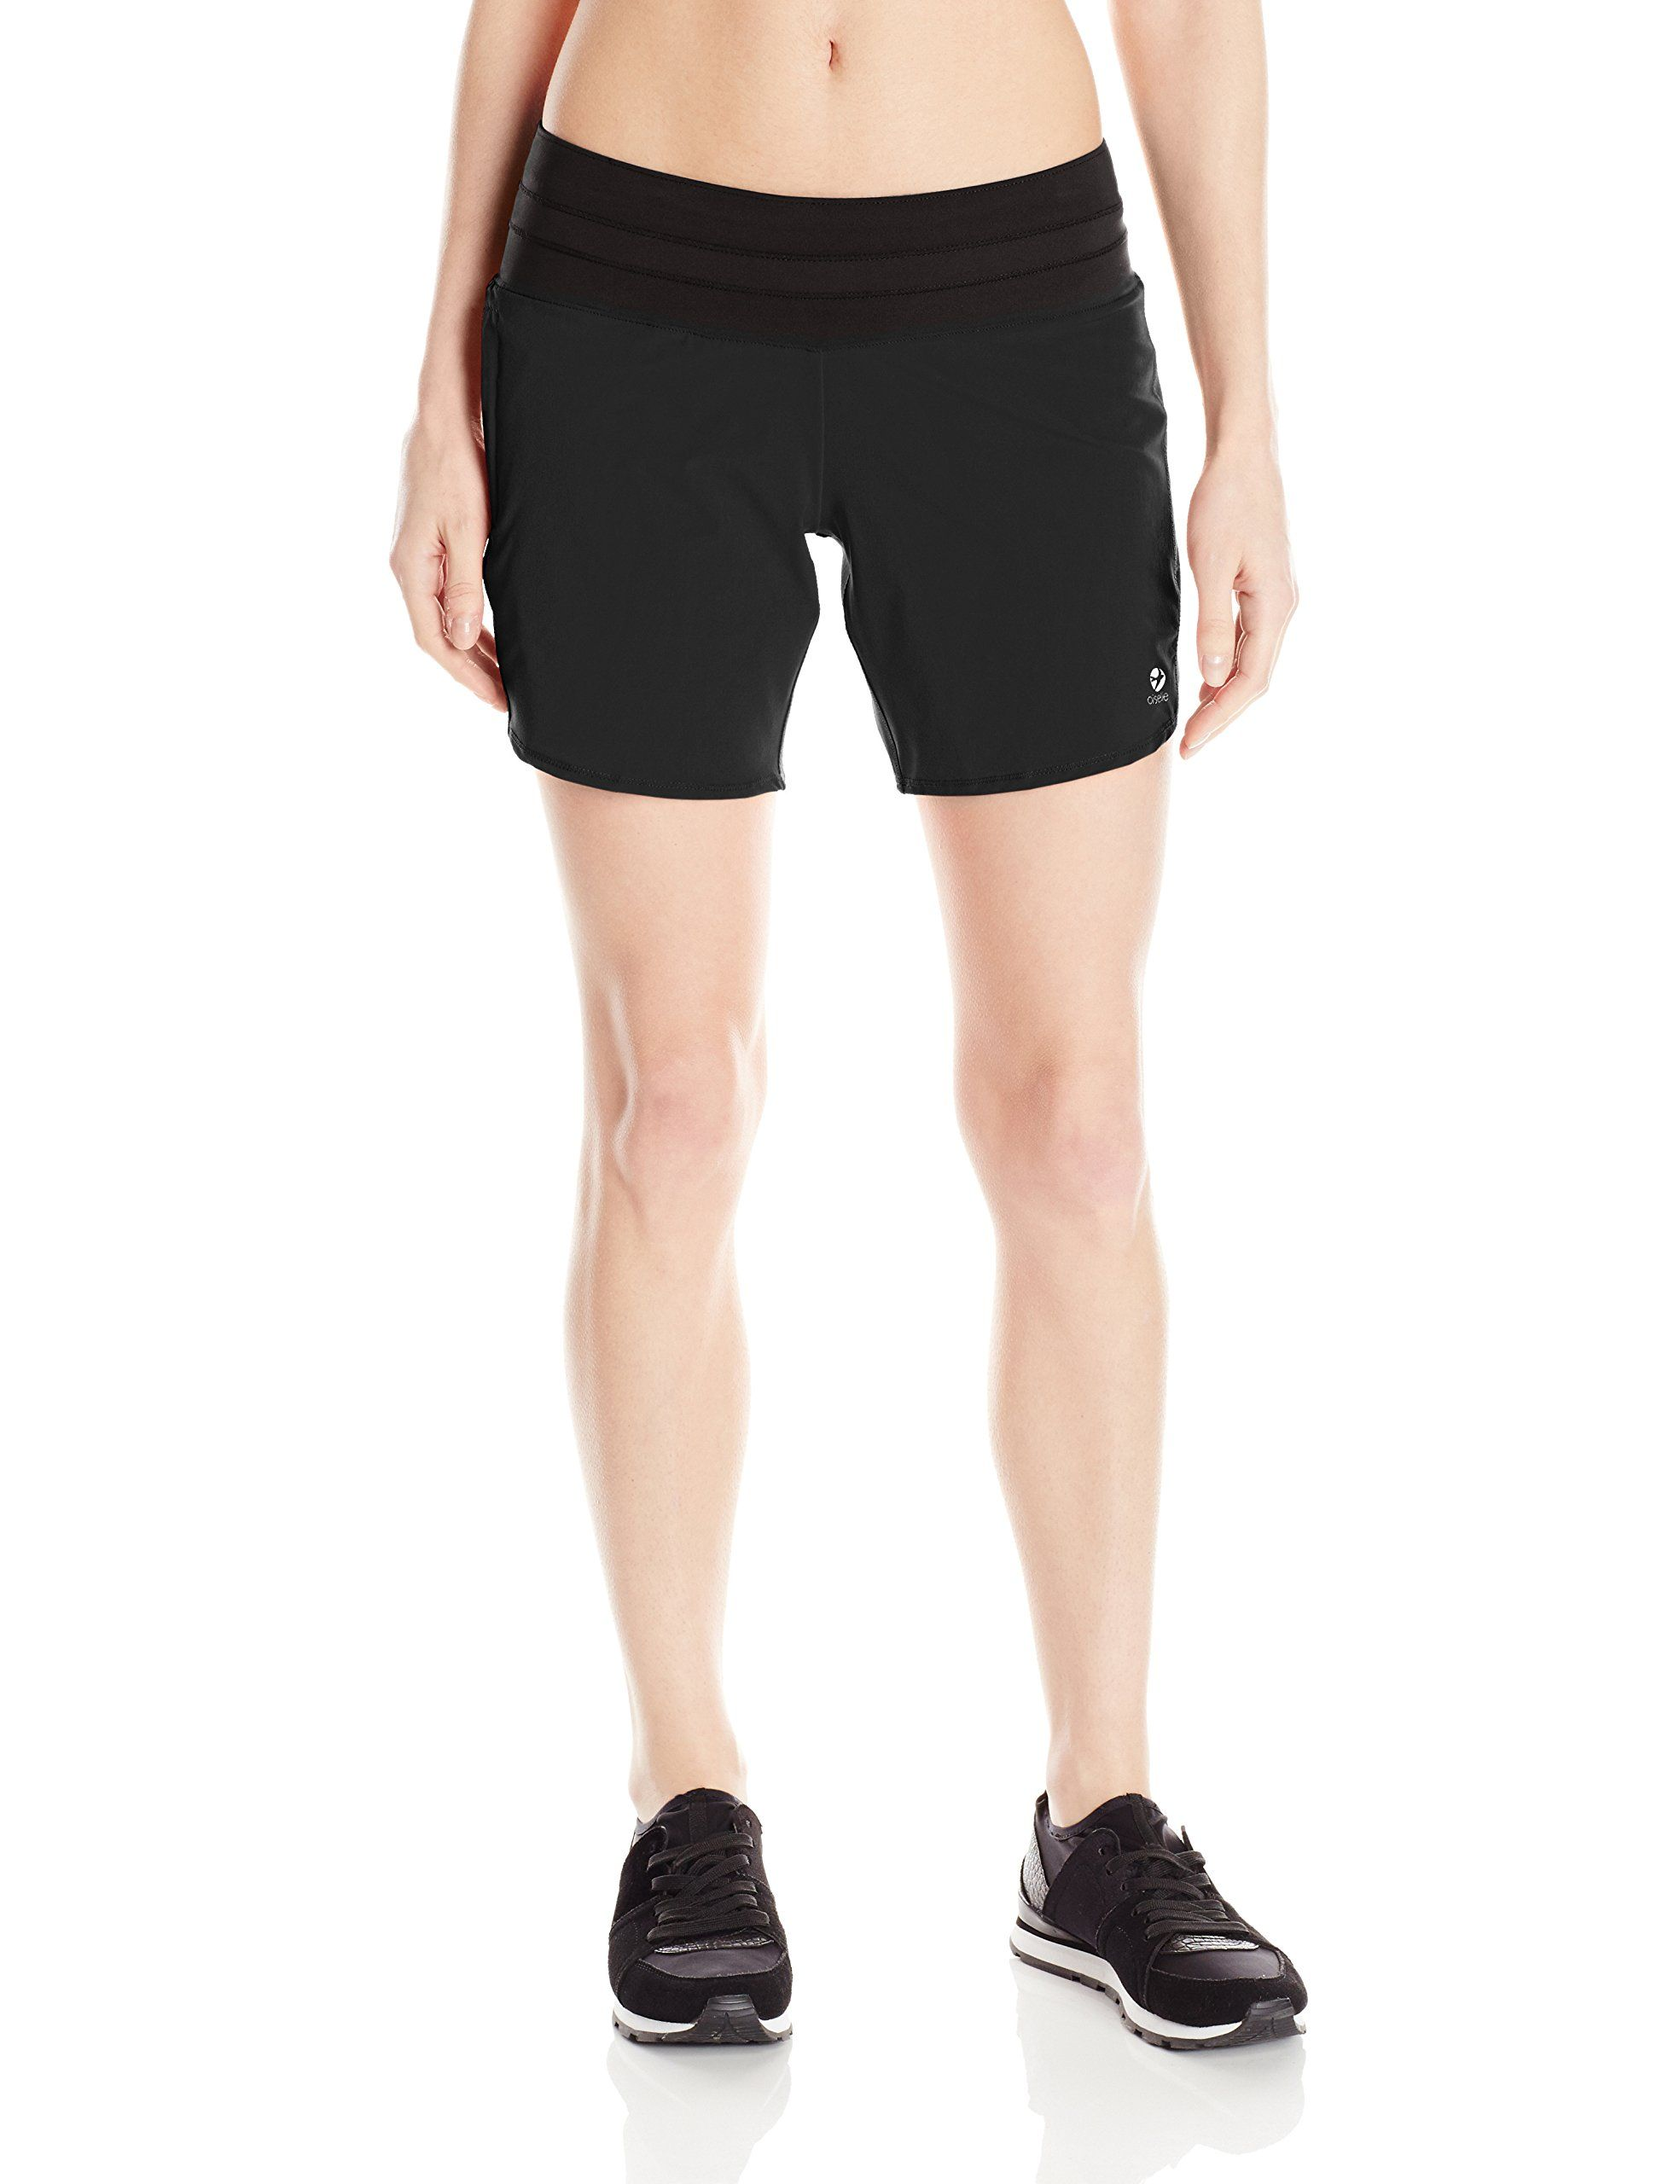 6 inseam shorts womens